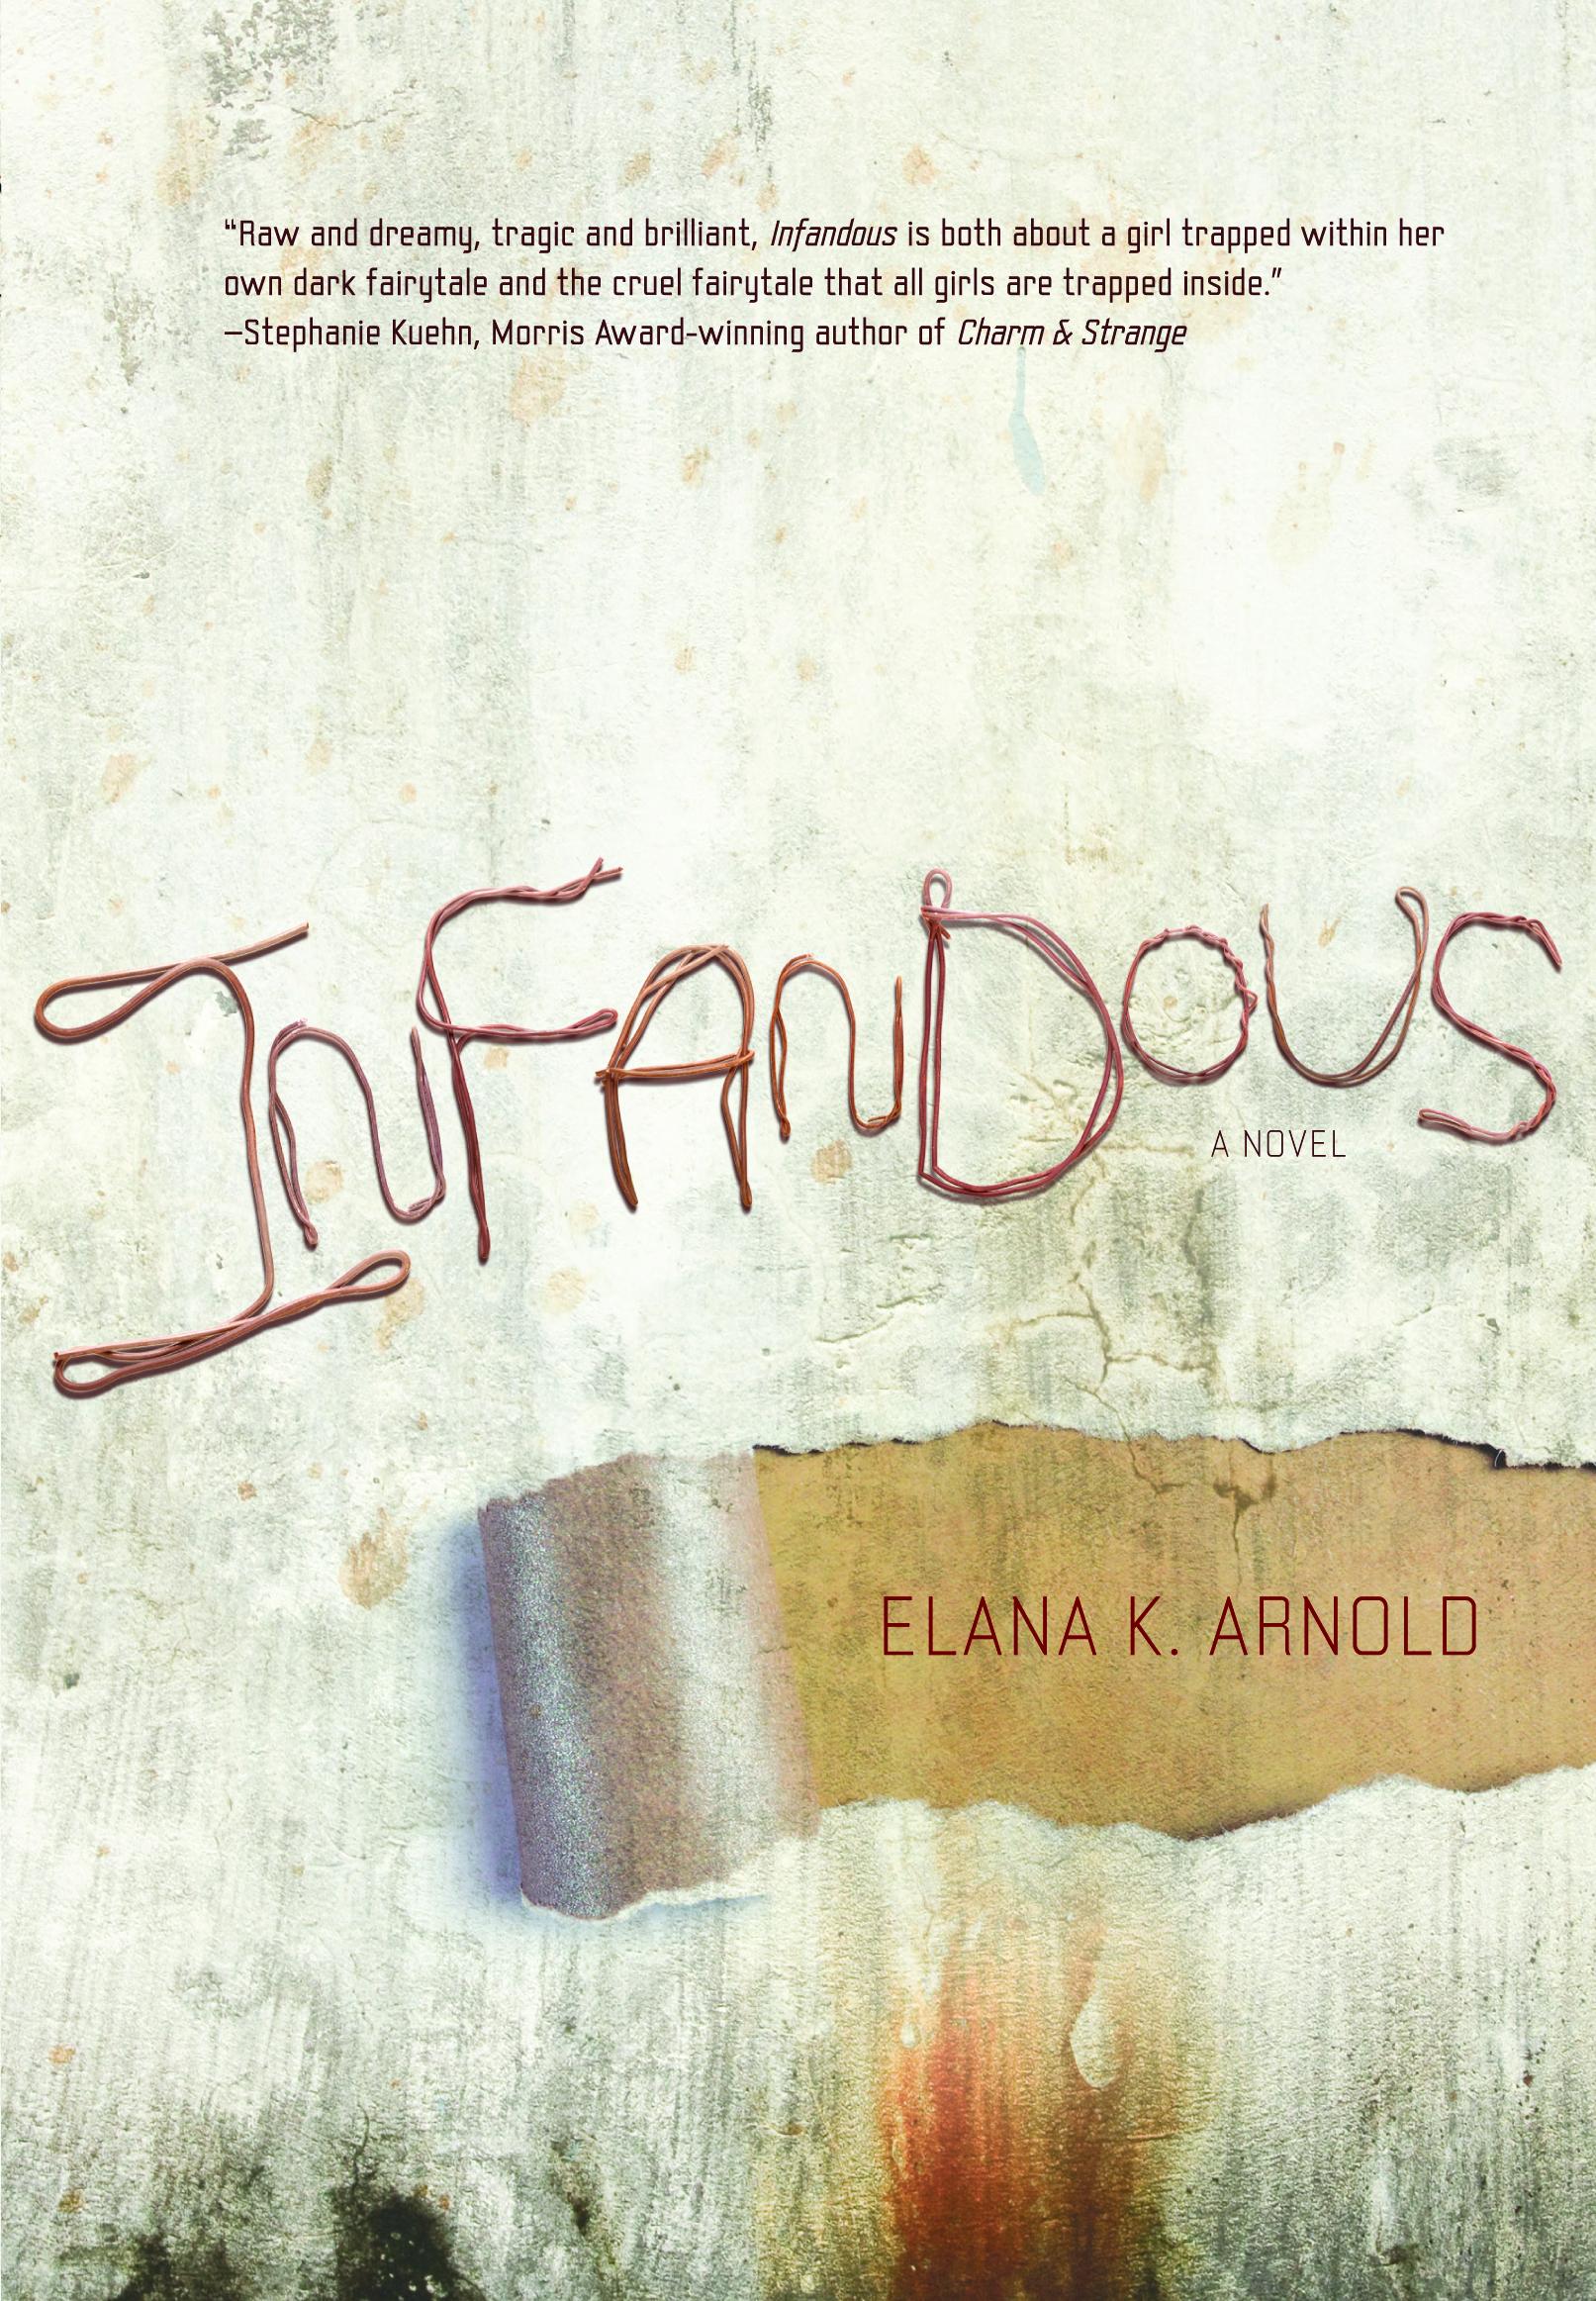 Infandous Cover.jpg